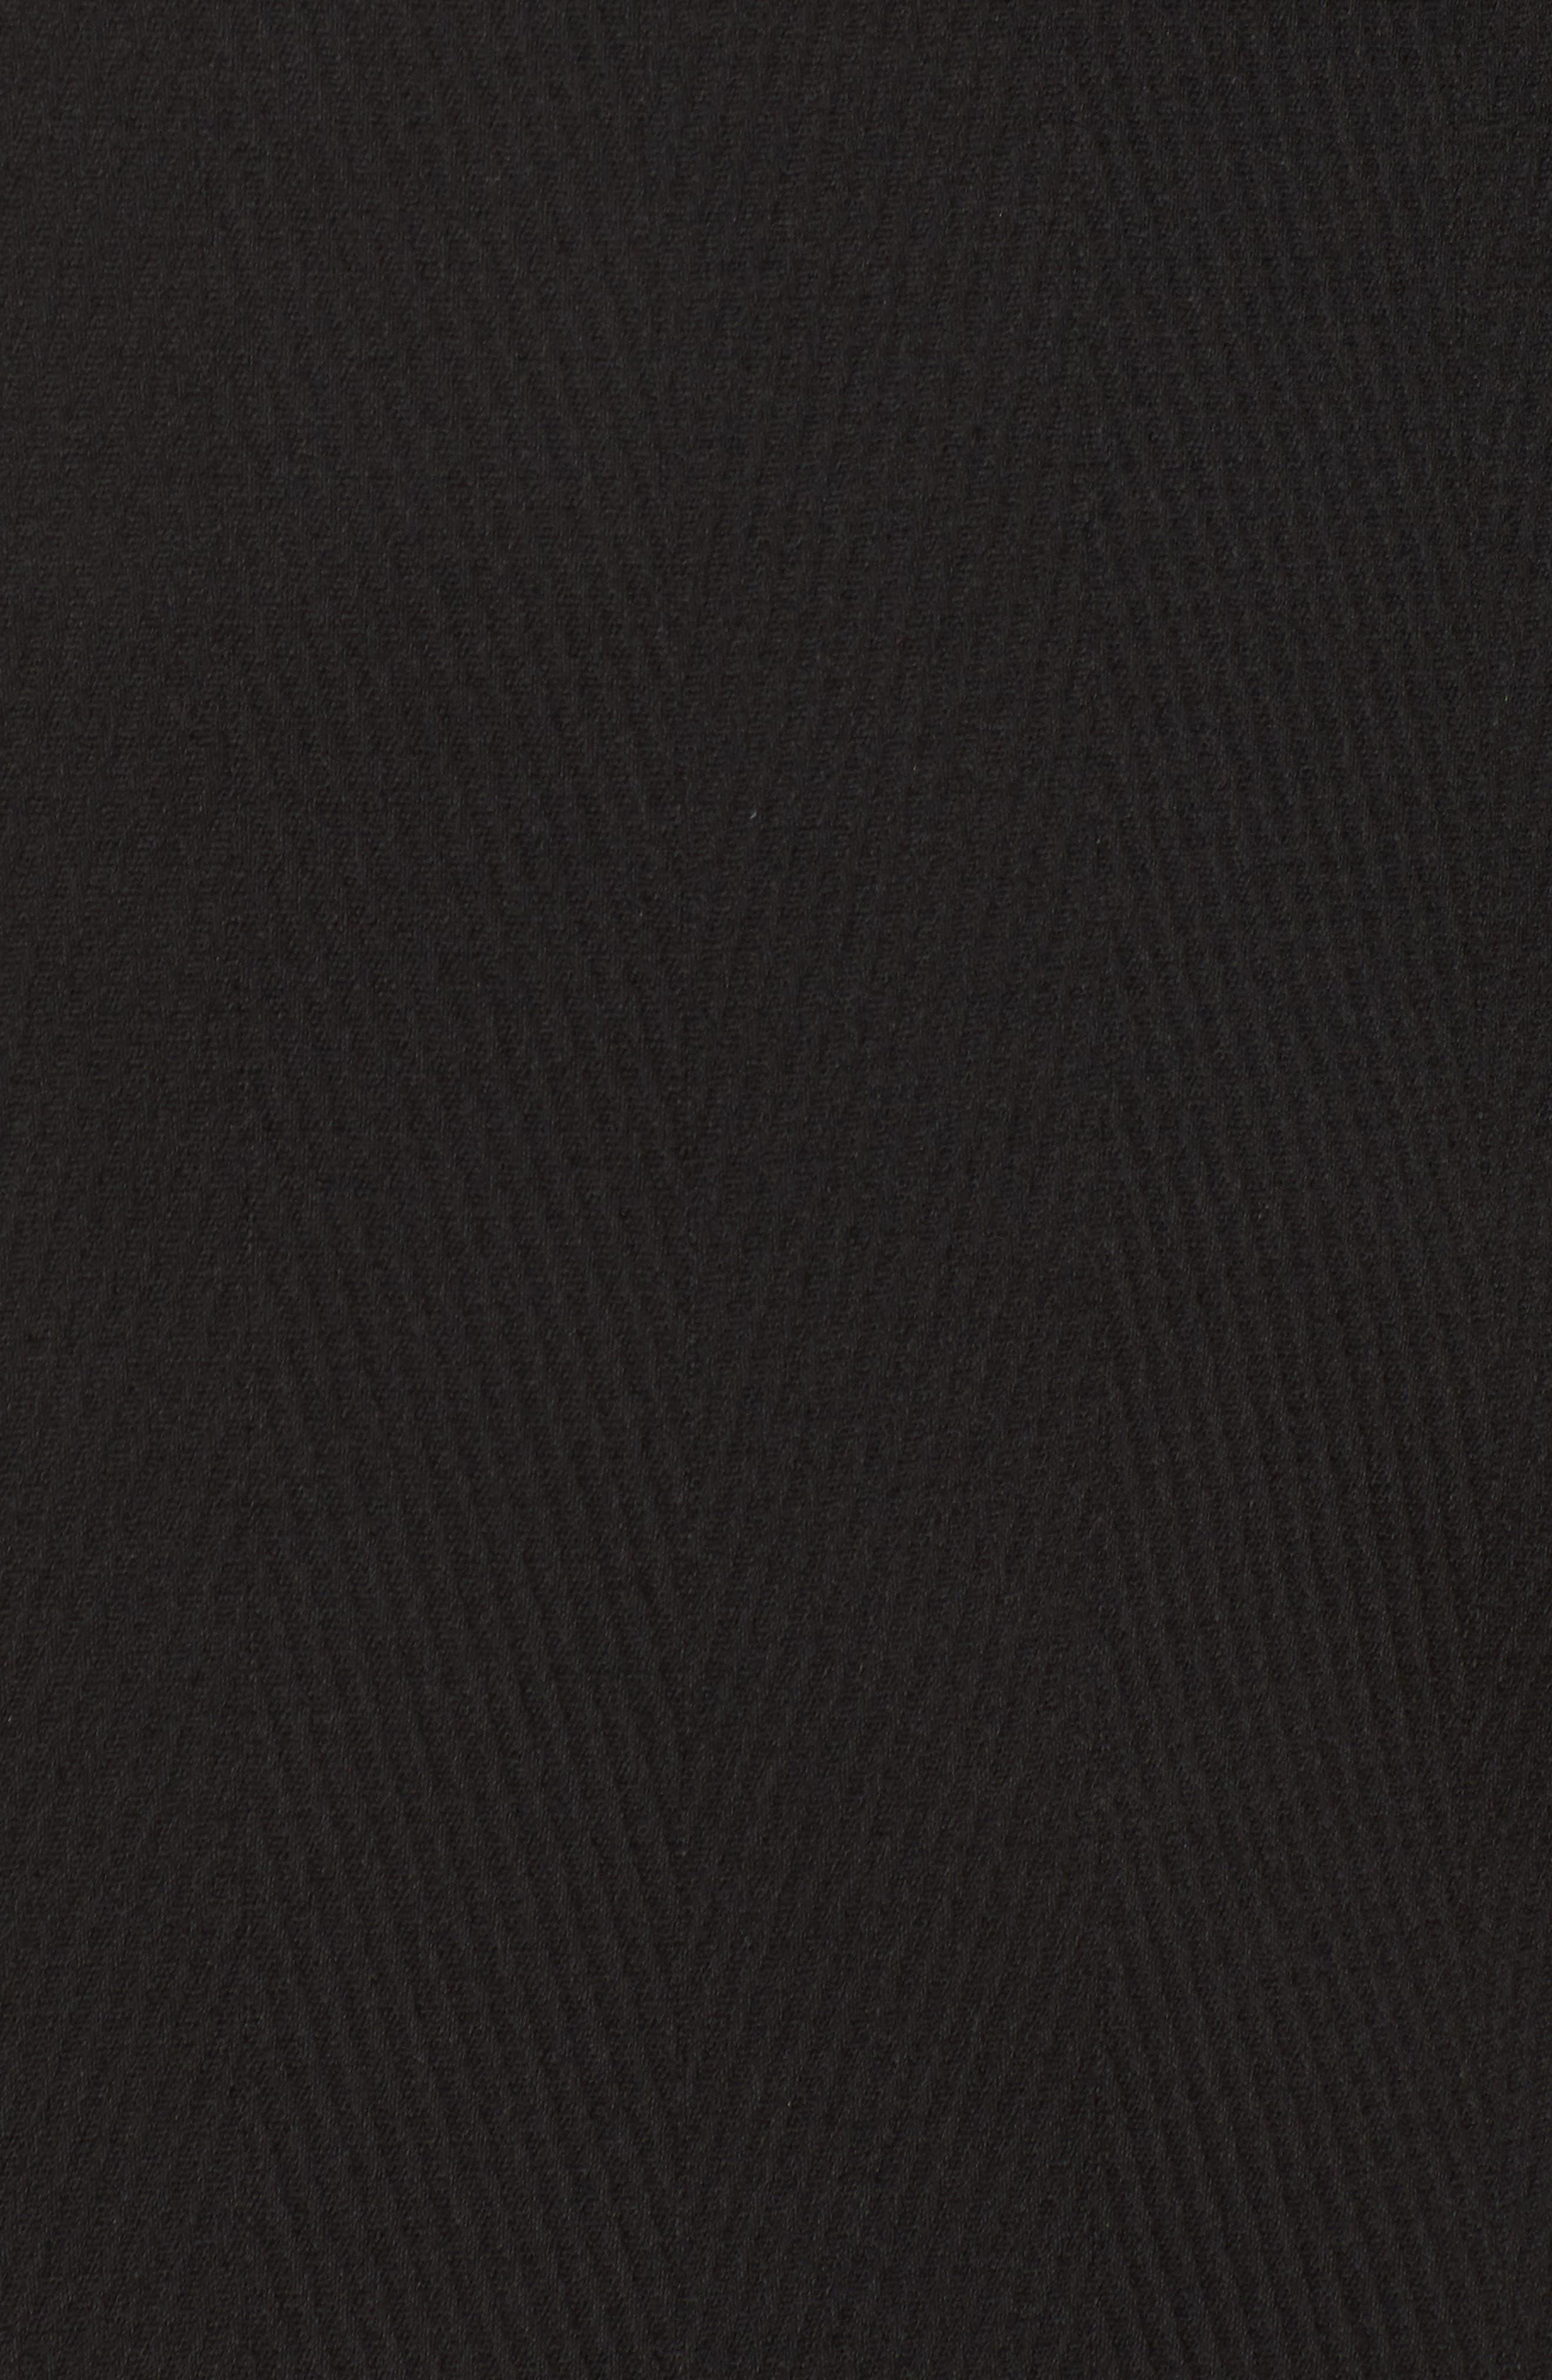 Dasmia Sheath Dress,                             Alternate thumbnail 6, color,                             Black